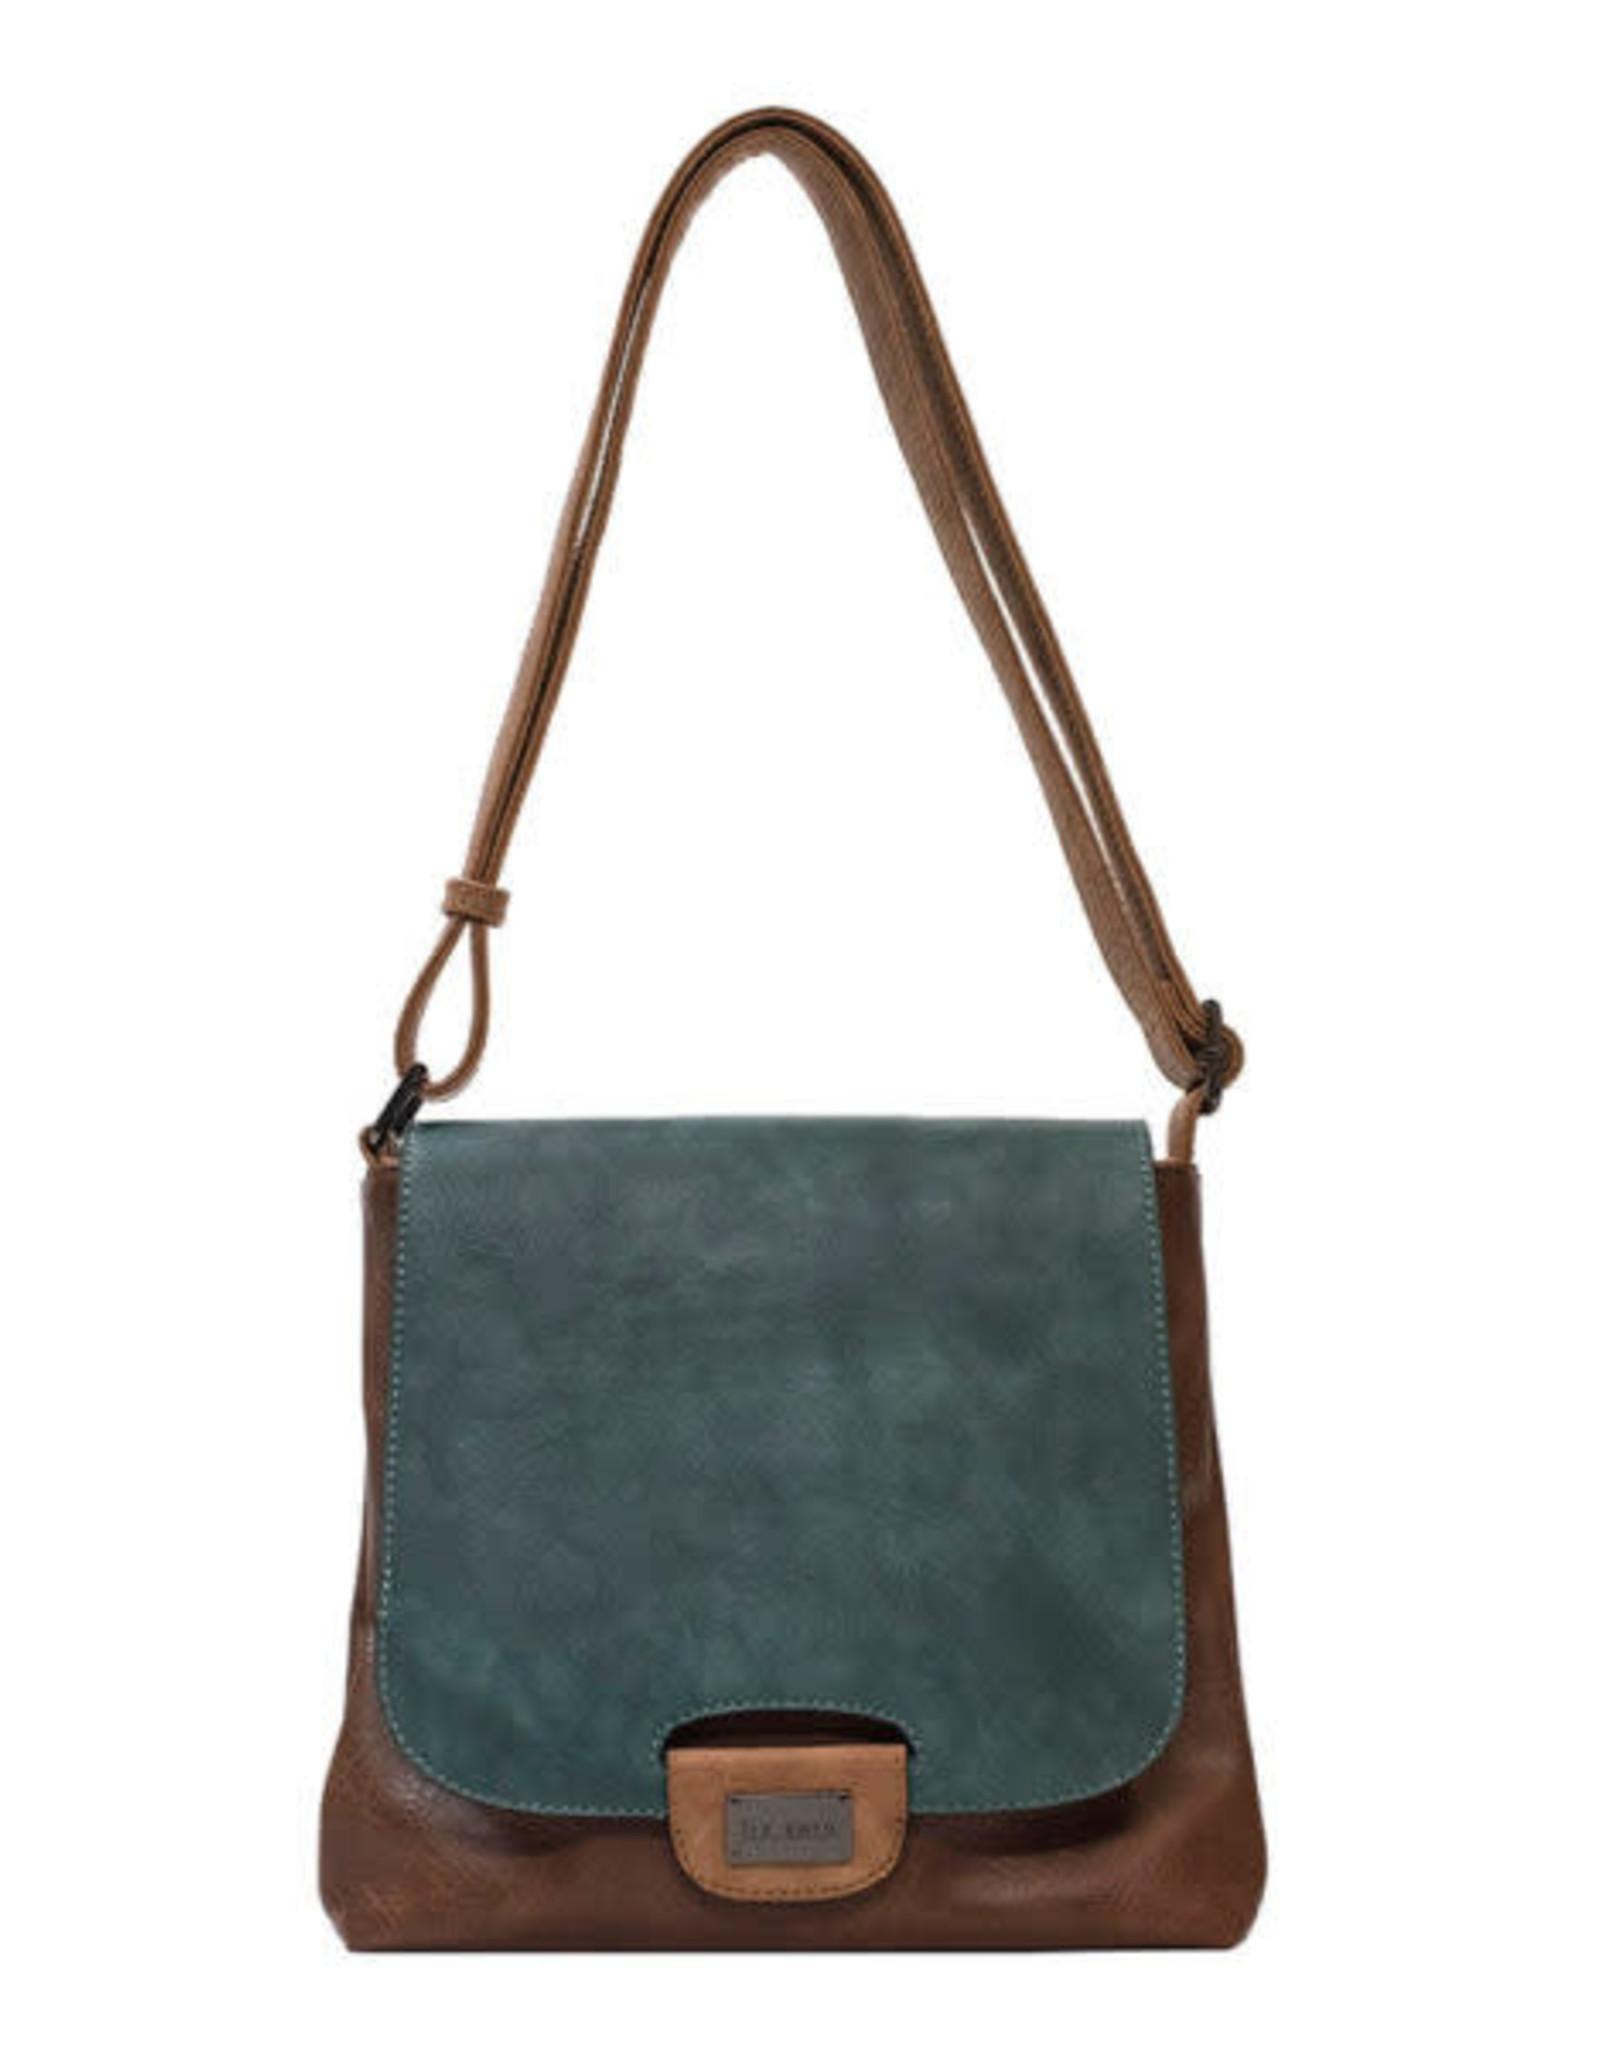 Liz Soto Handbags Amy Crossbody